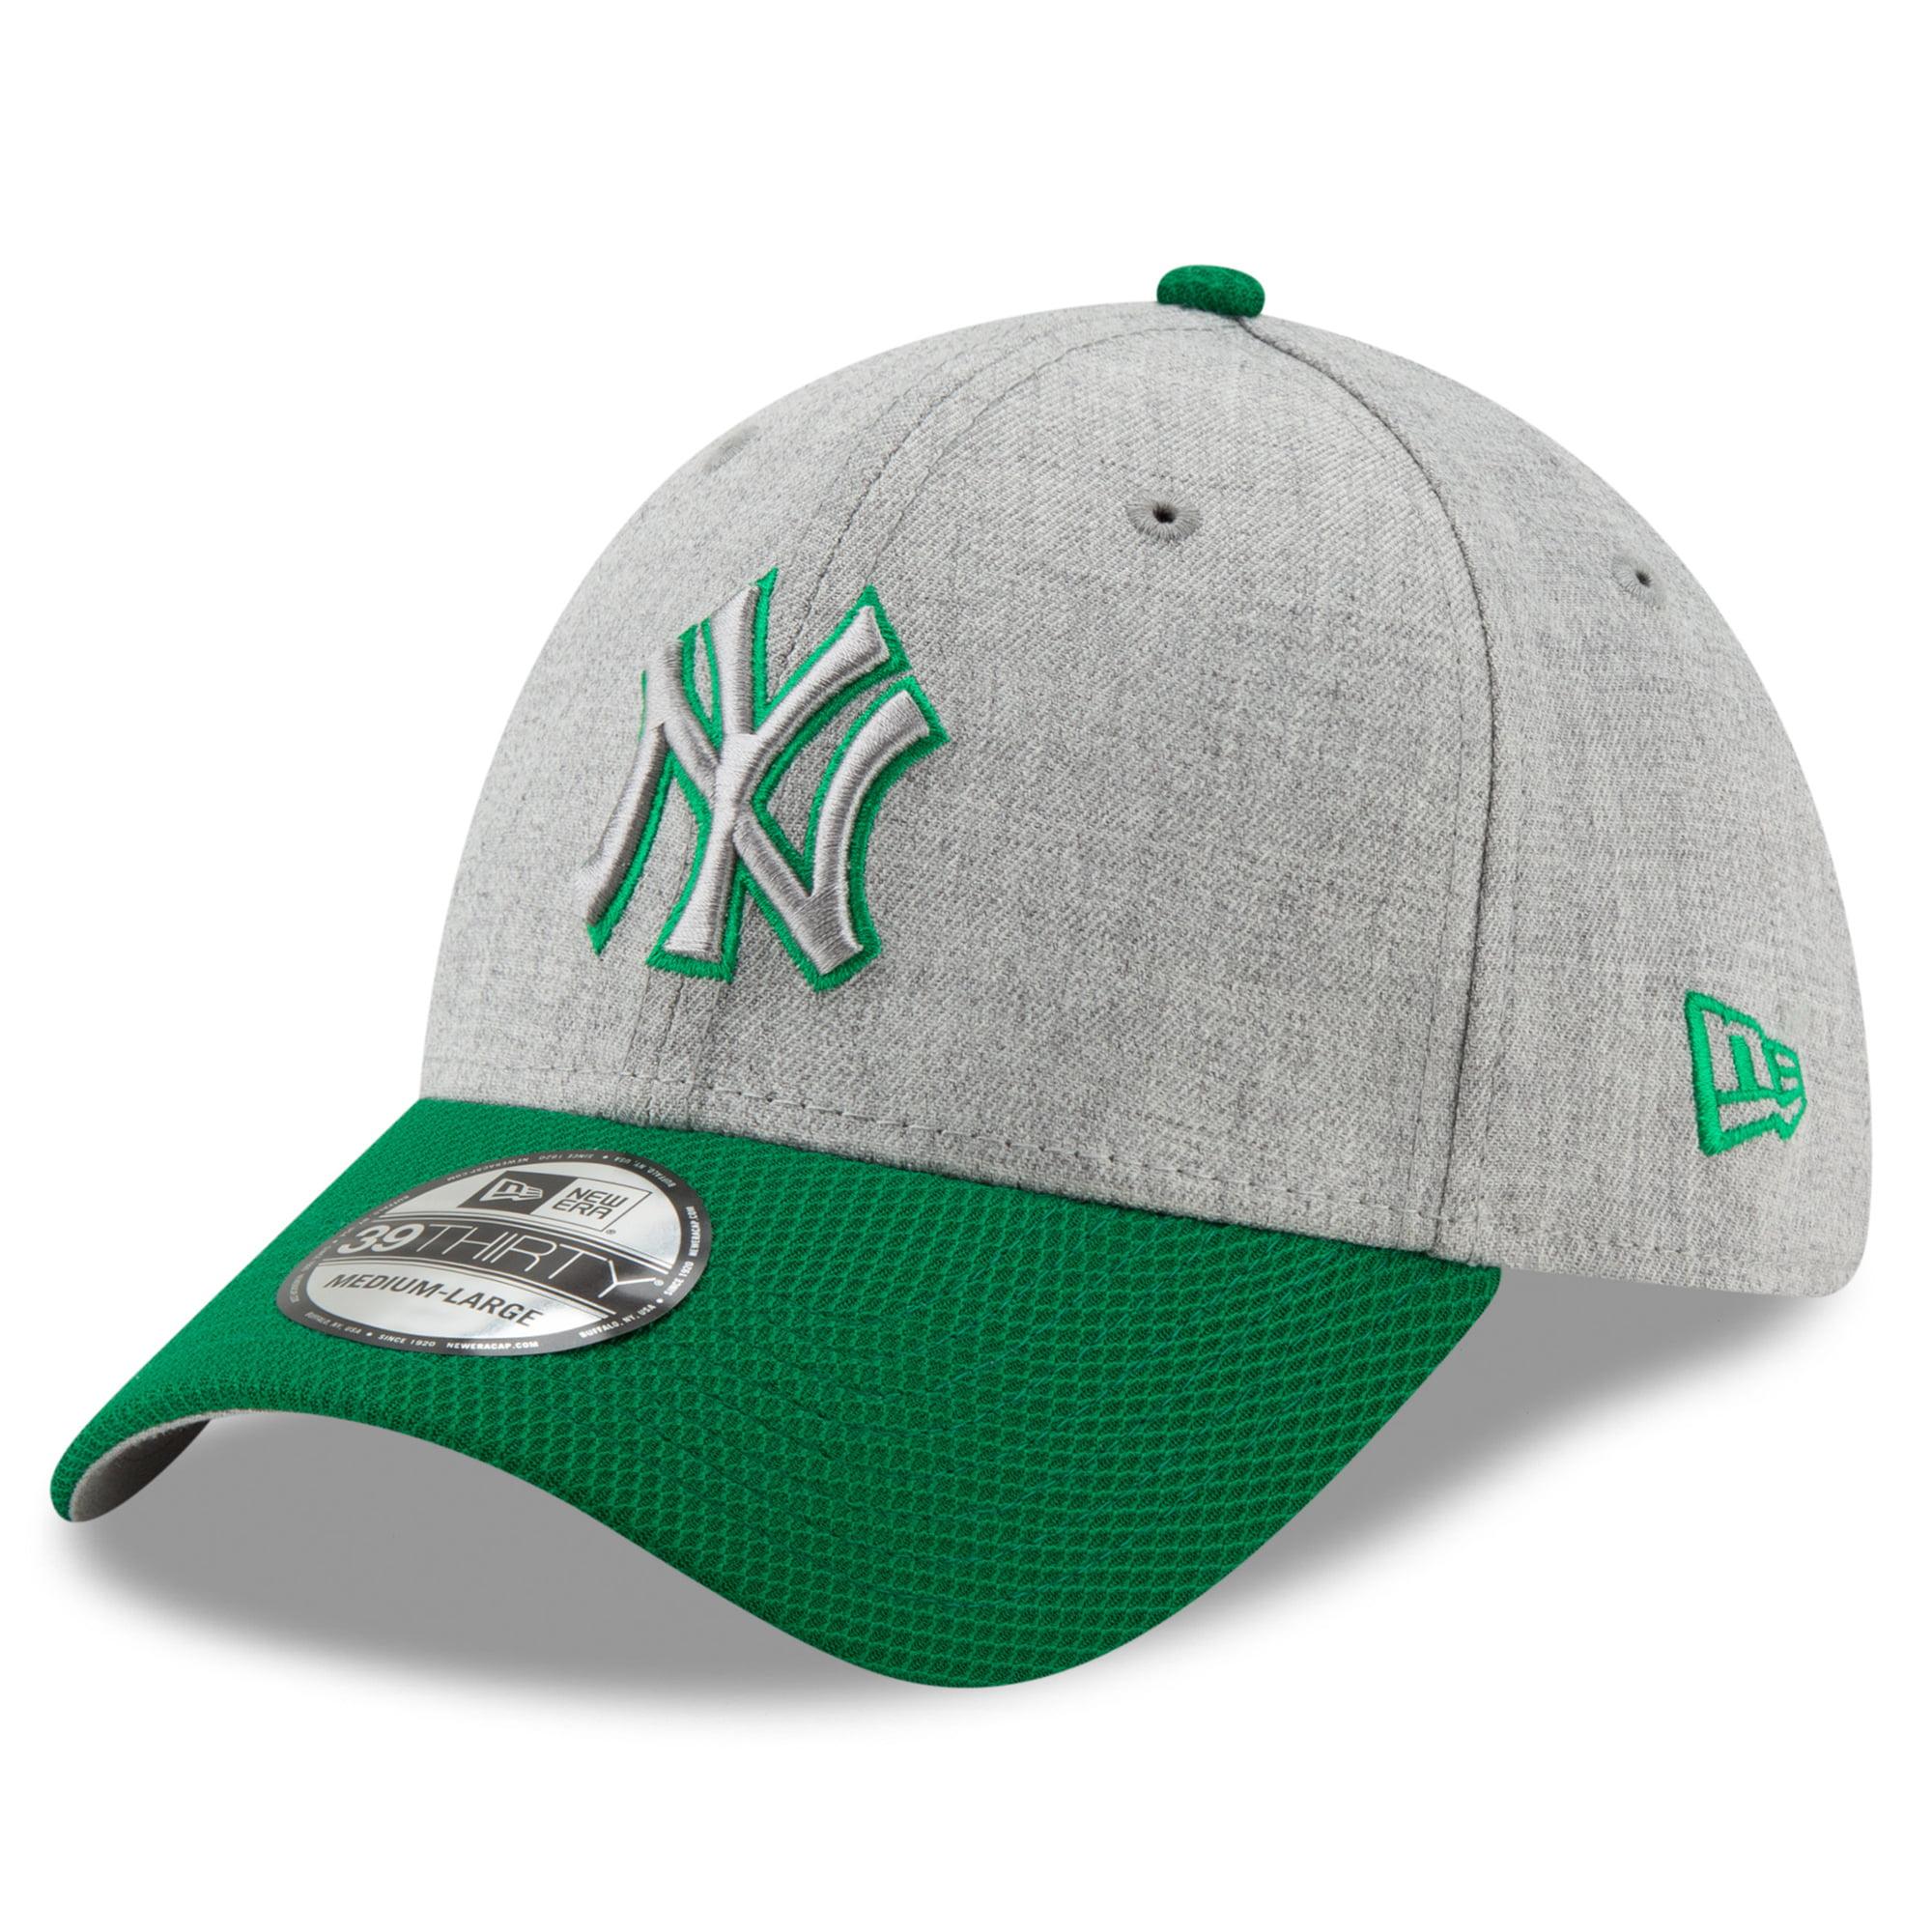 New York Yankees New Era St. Patrick's Day Change Up Redux 39THIRTY Flex Hat - Gray/Green